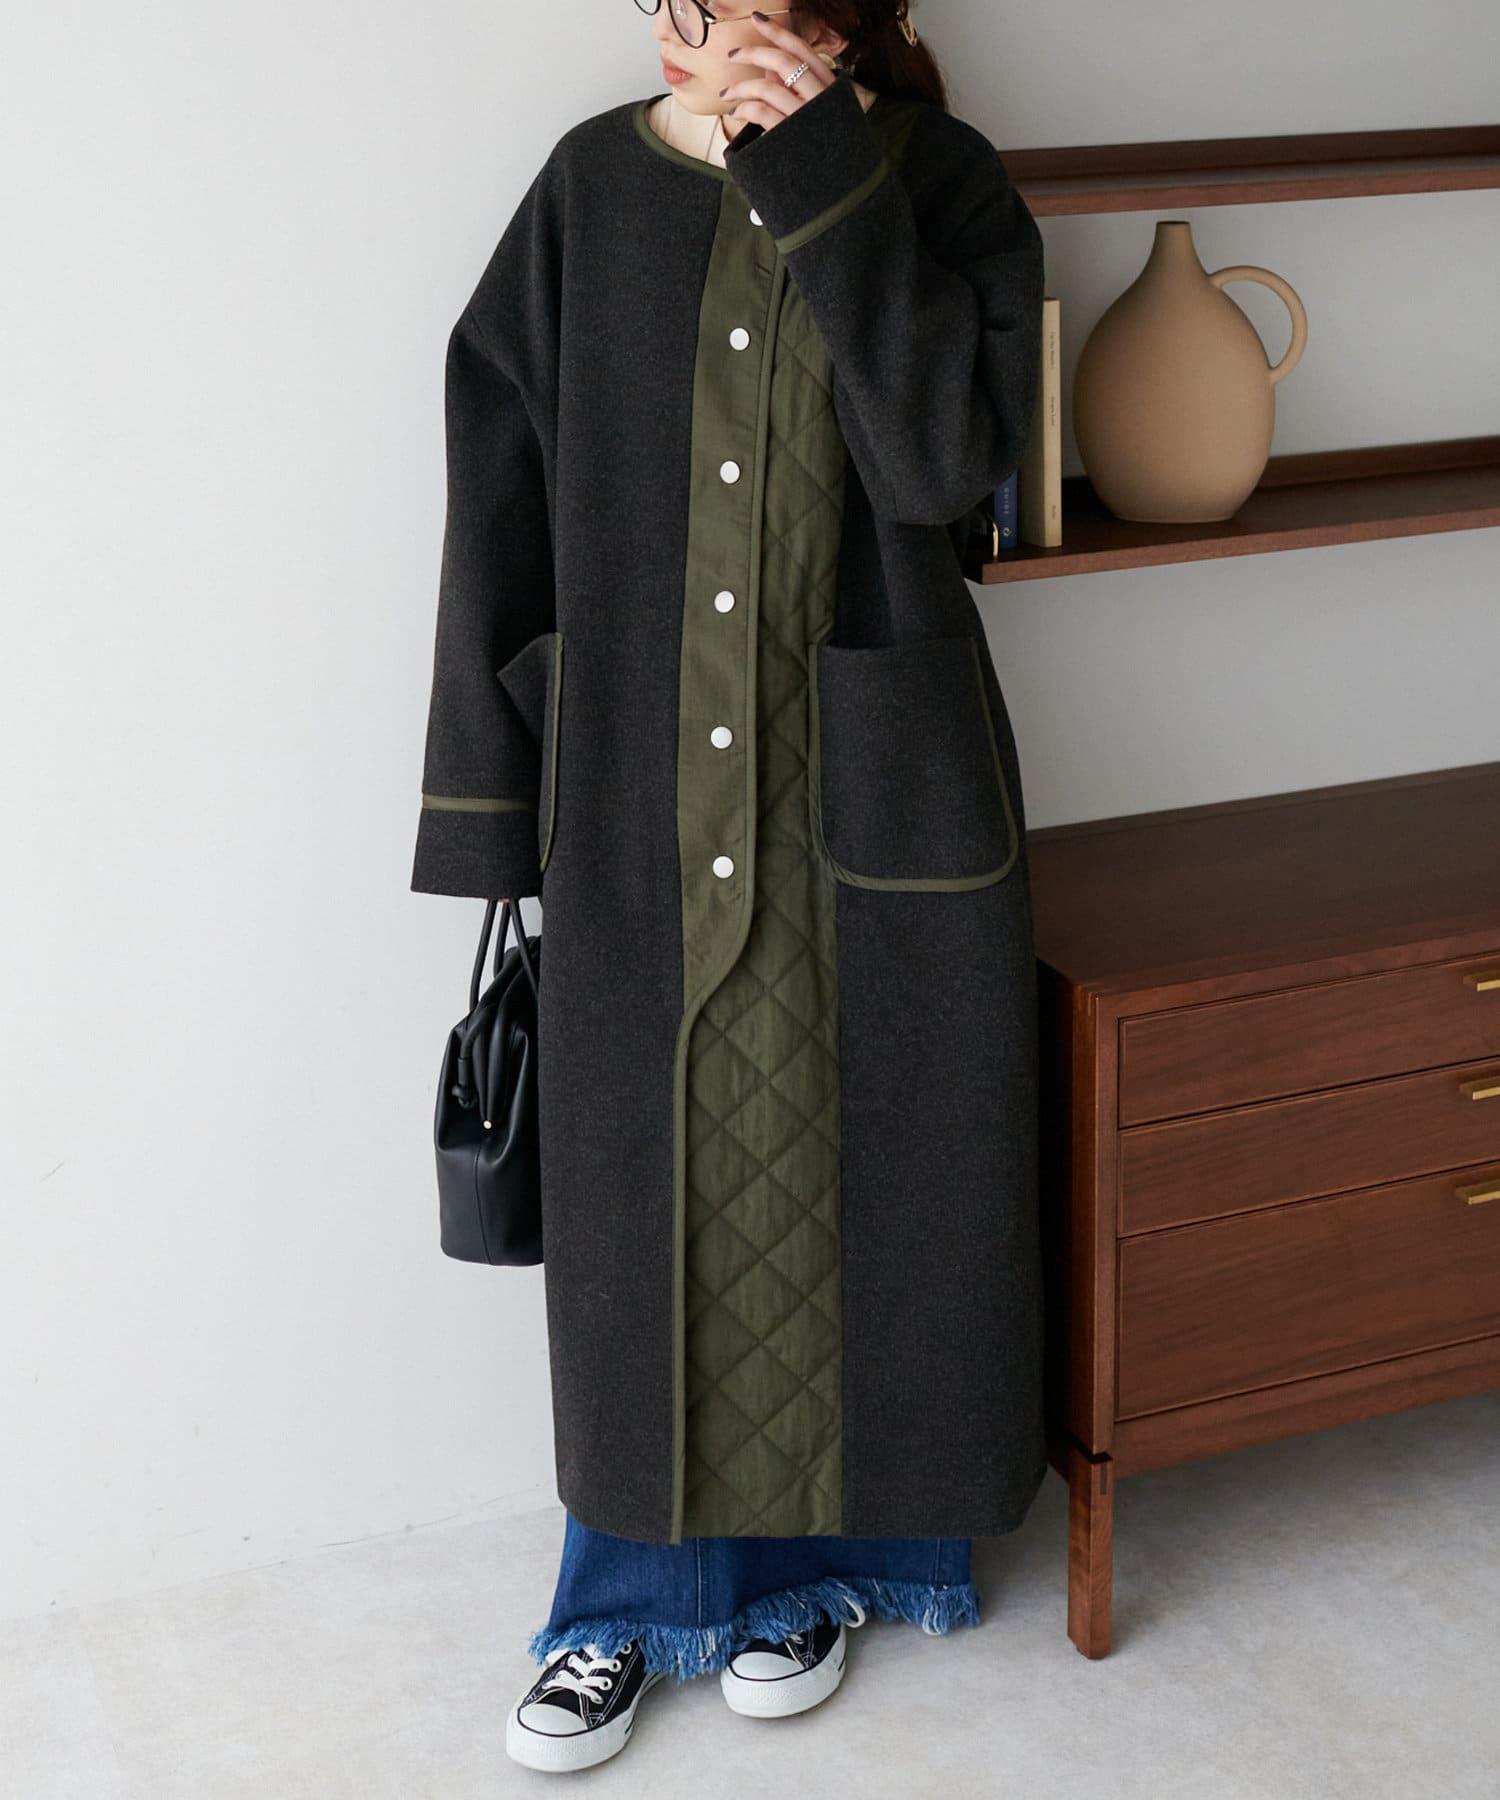 Discoat(ディスコート) 異素材切替ロングコート